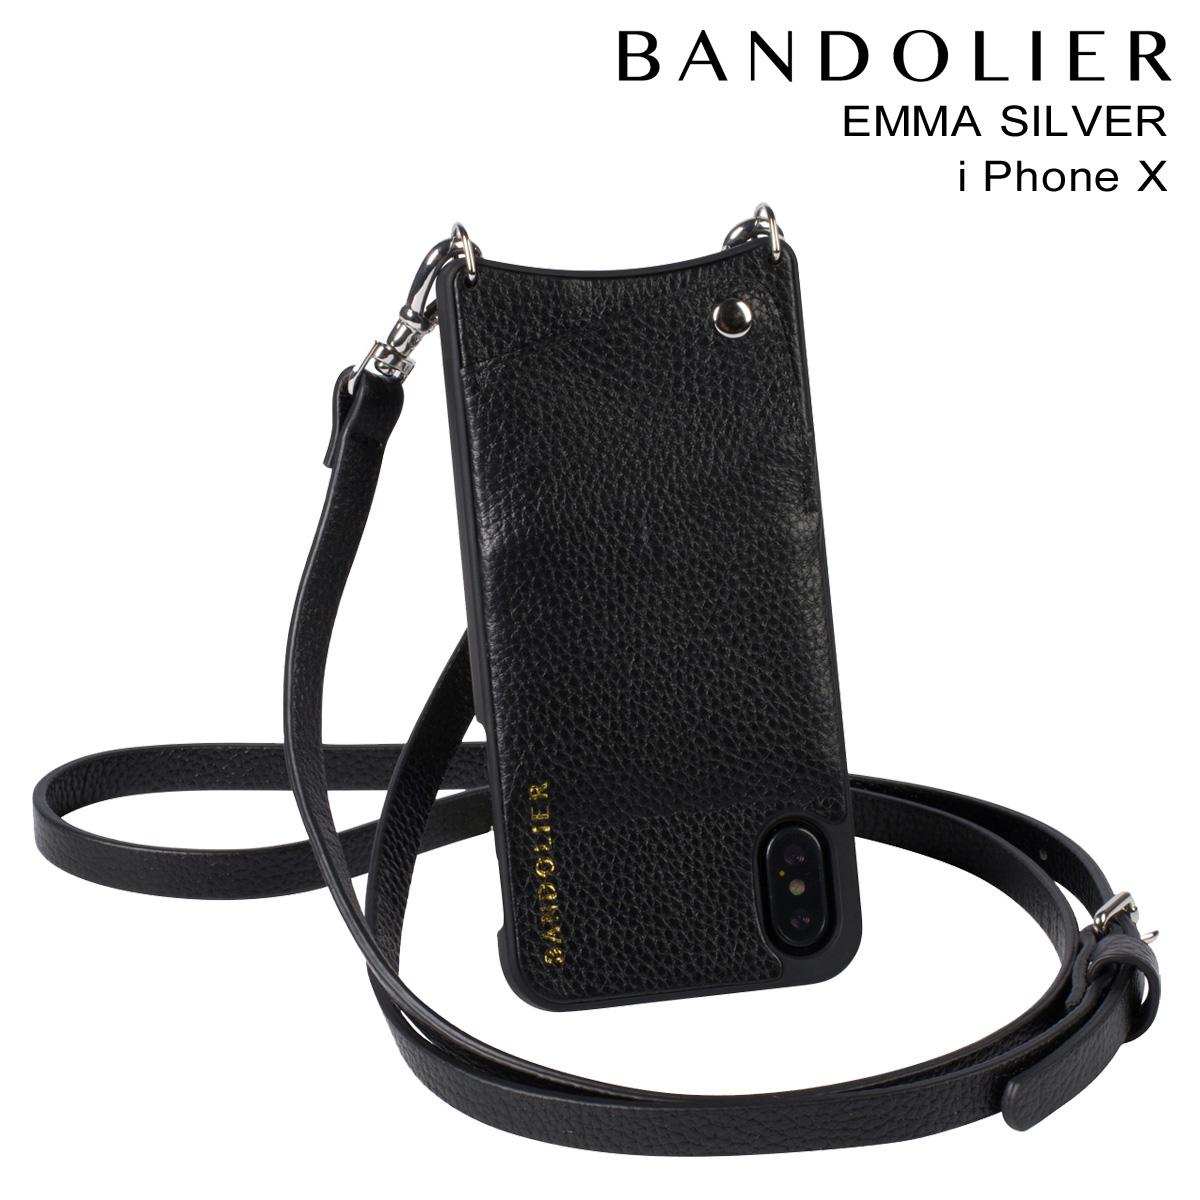 BANDOLIER EMMA SILVER バンドリヤー iPhoneX ケース スマホ アイフォン レザー メンズ レディース